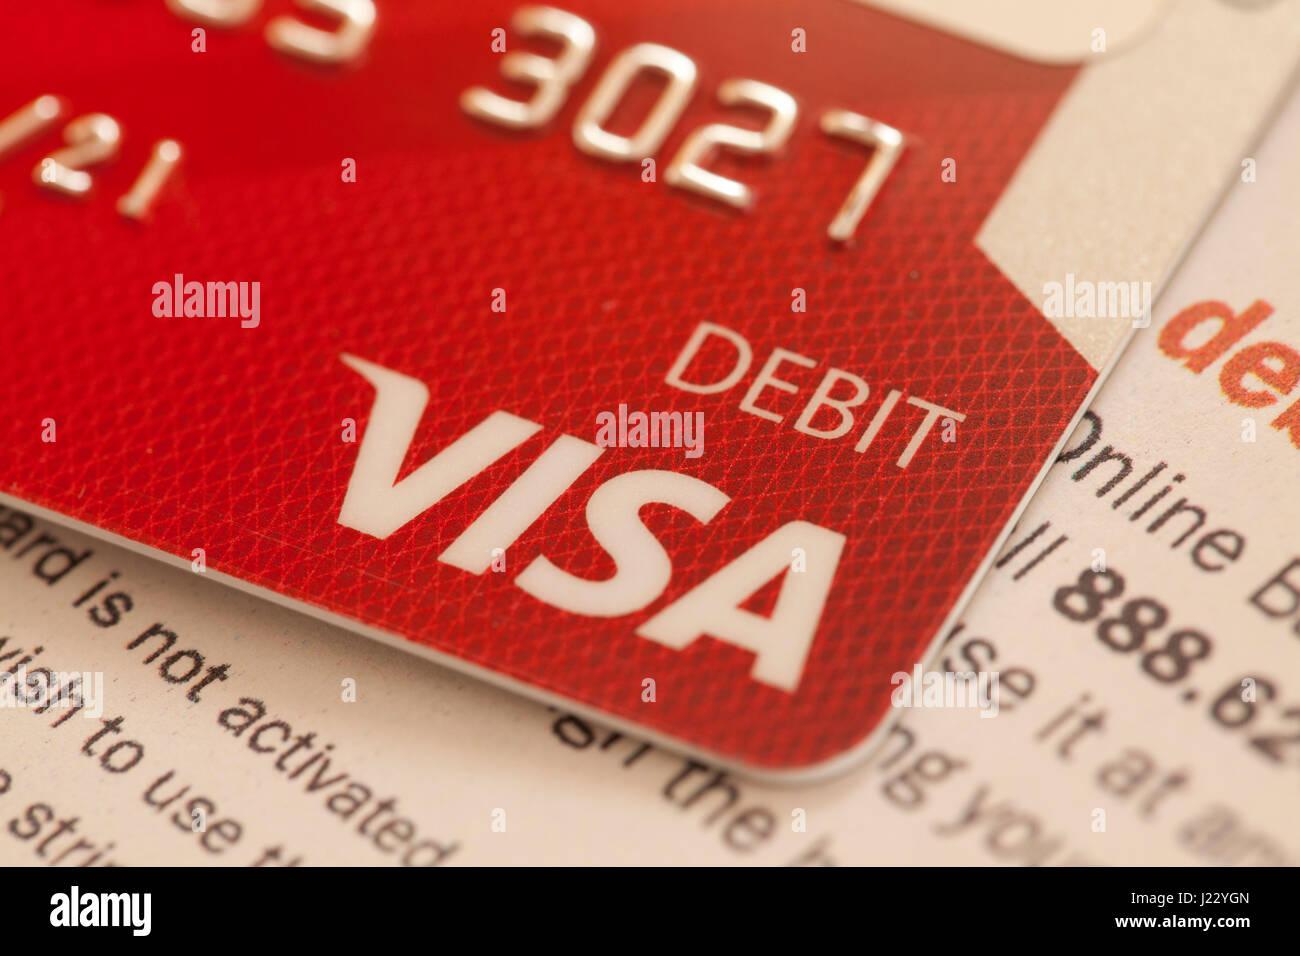 Visa Debit card - UsA - Stock Image